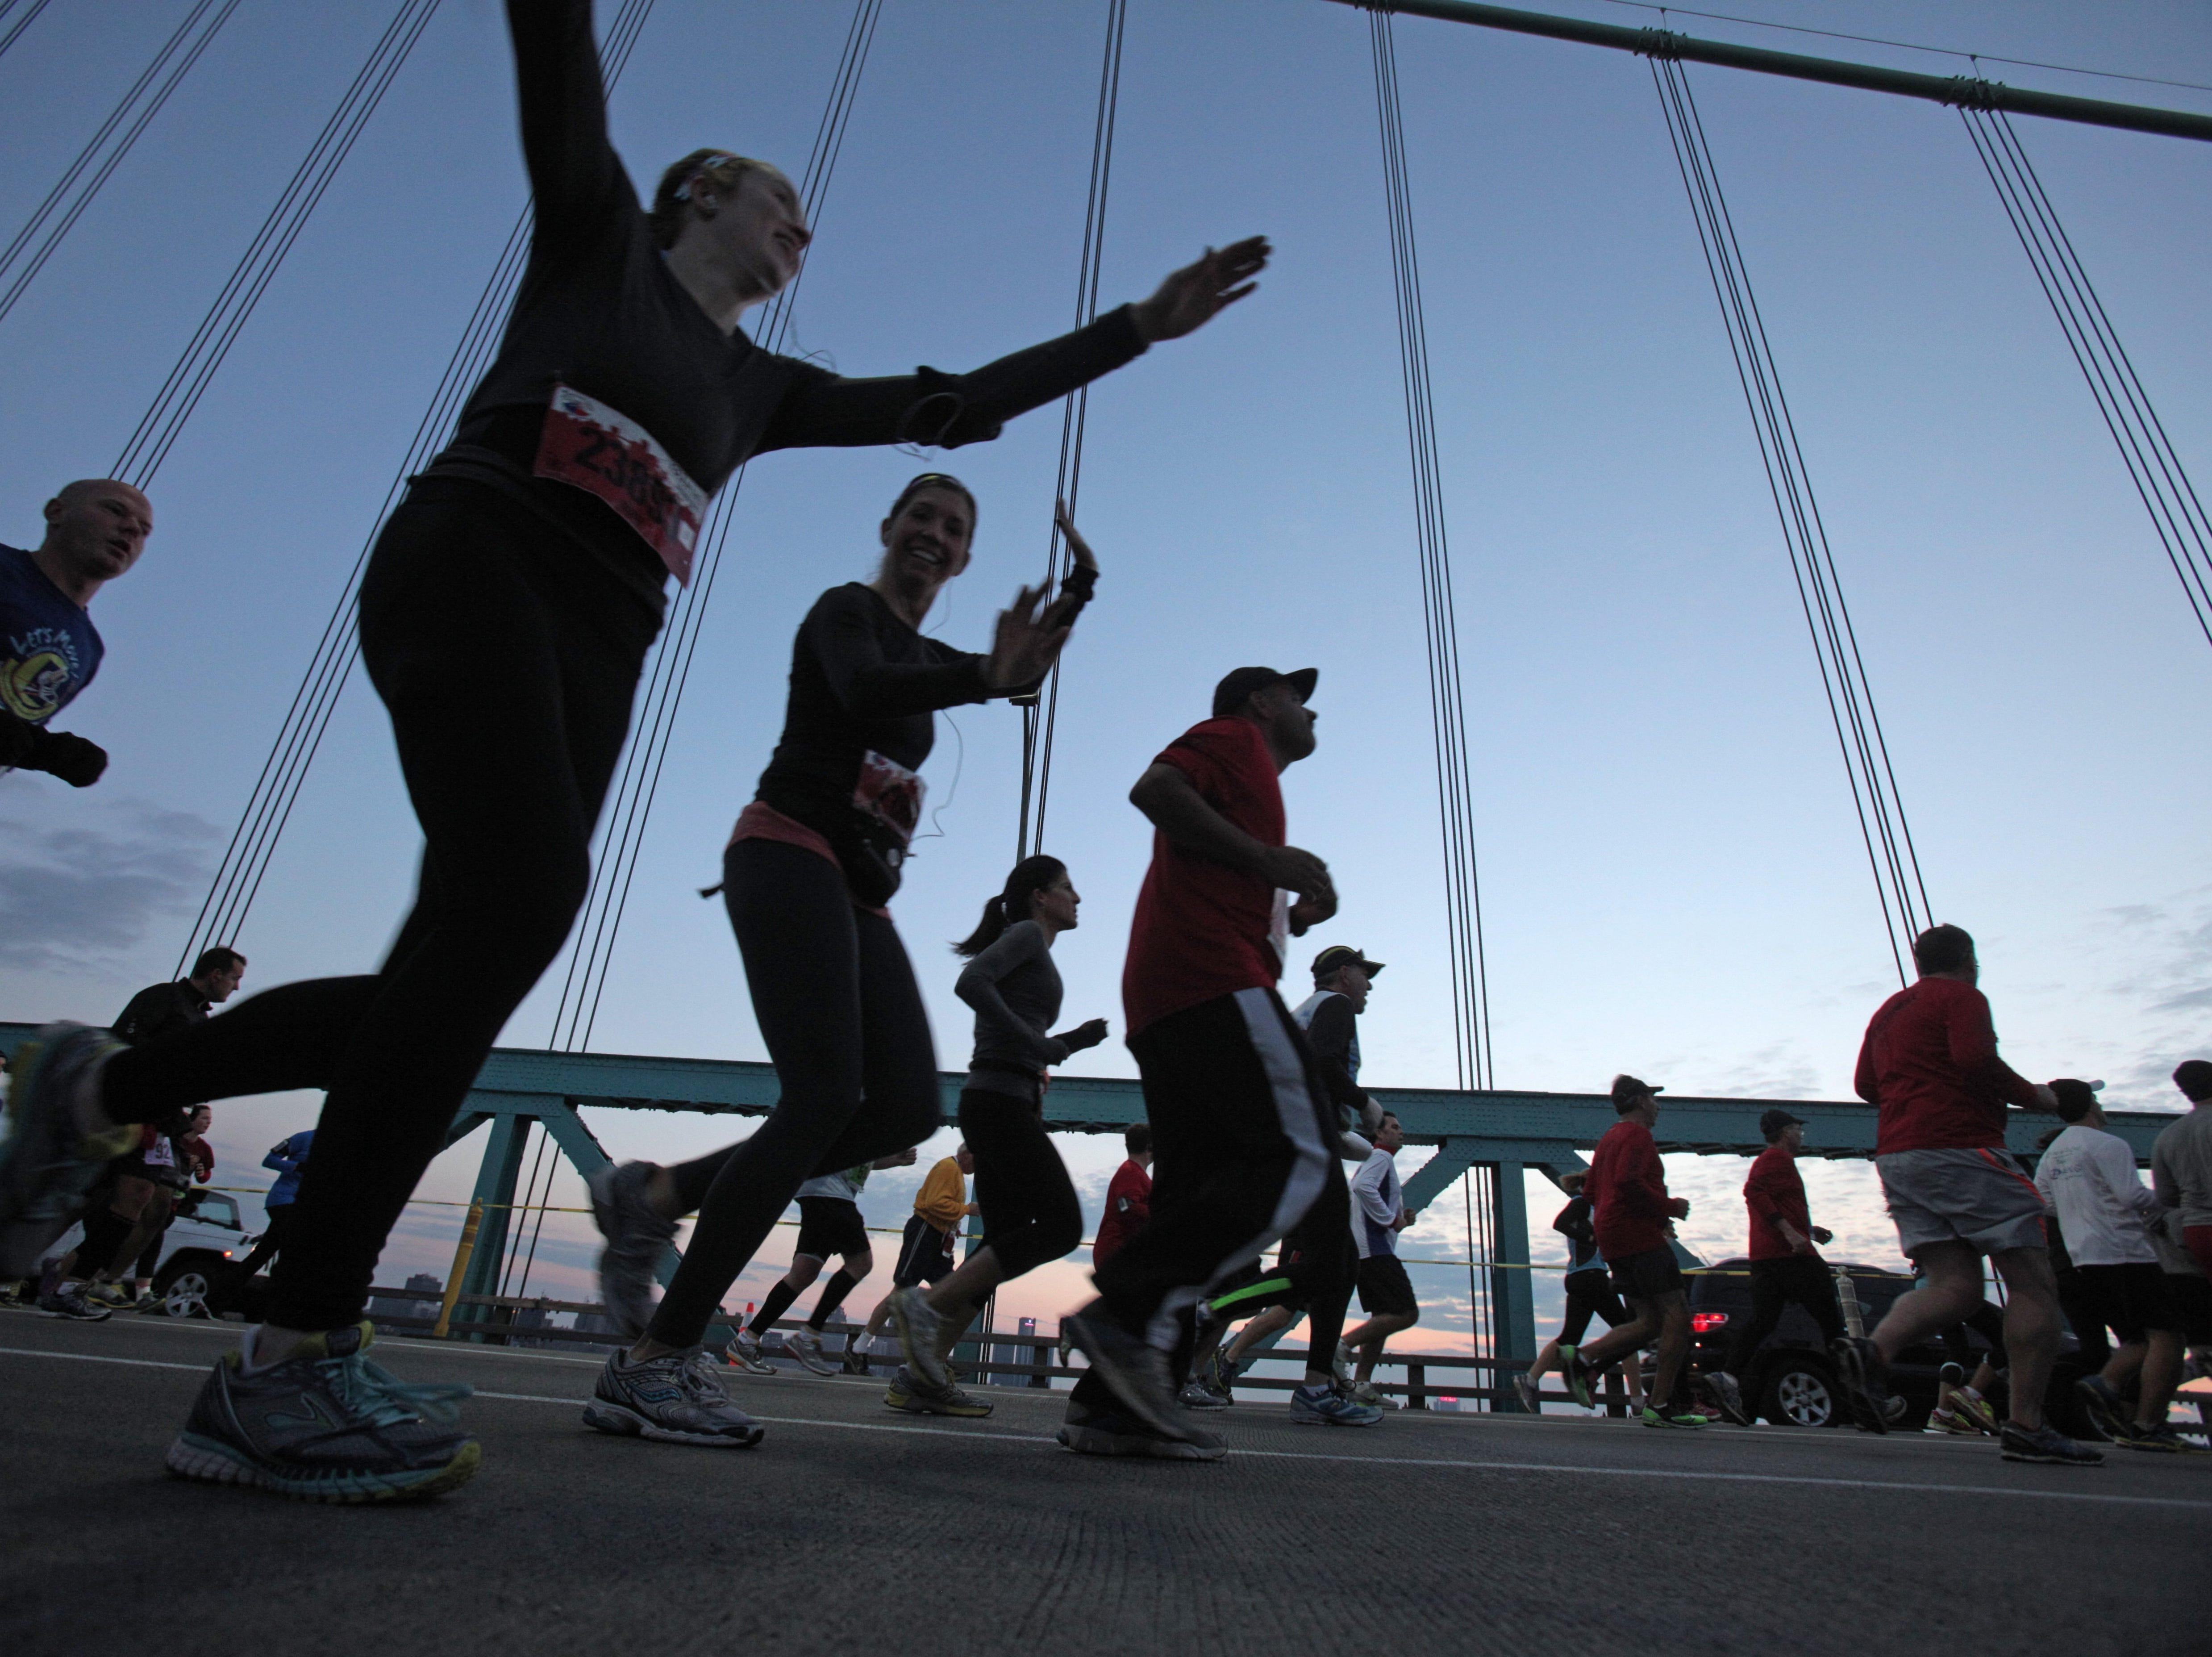 Runners run across the Ambassador Bridge during the 36th Annual Detroit Free Press/Talmer Bank Marathon in Detroit on Sunday, Oct. 20, 2013.